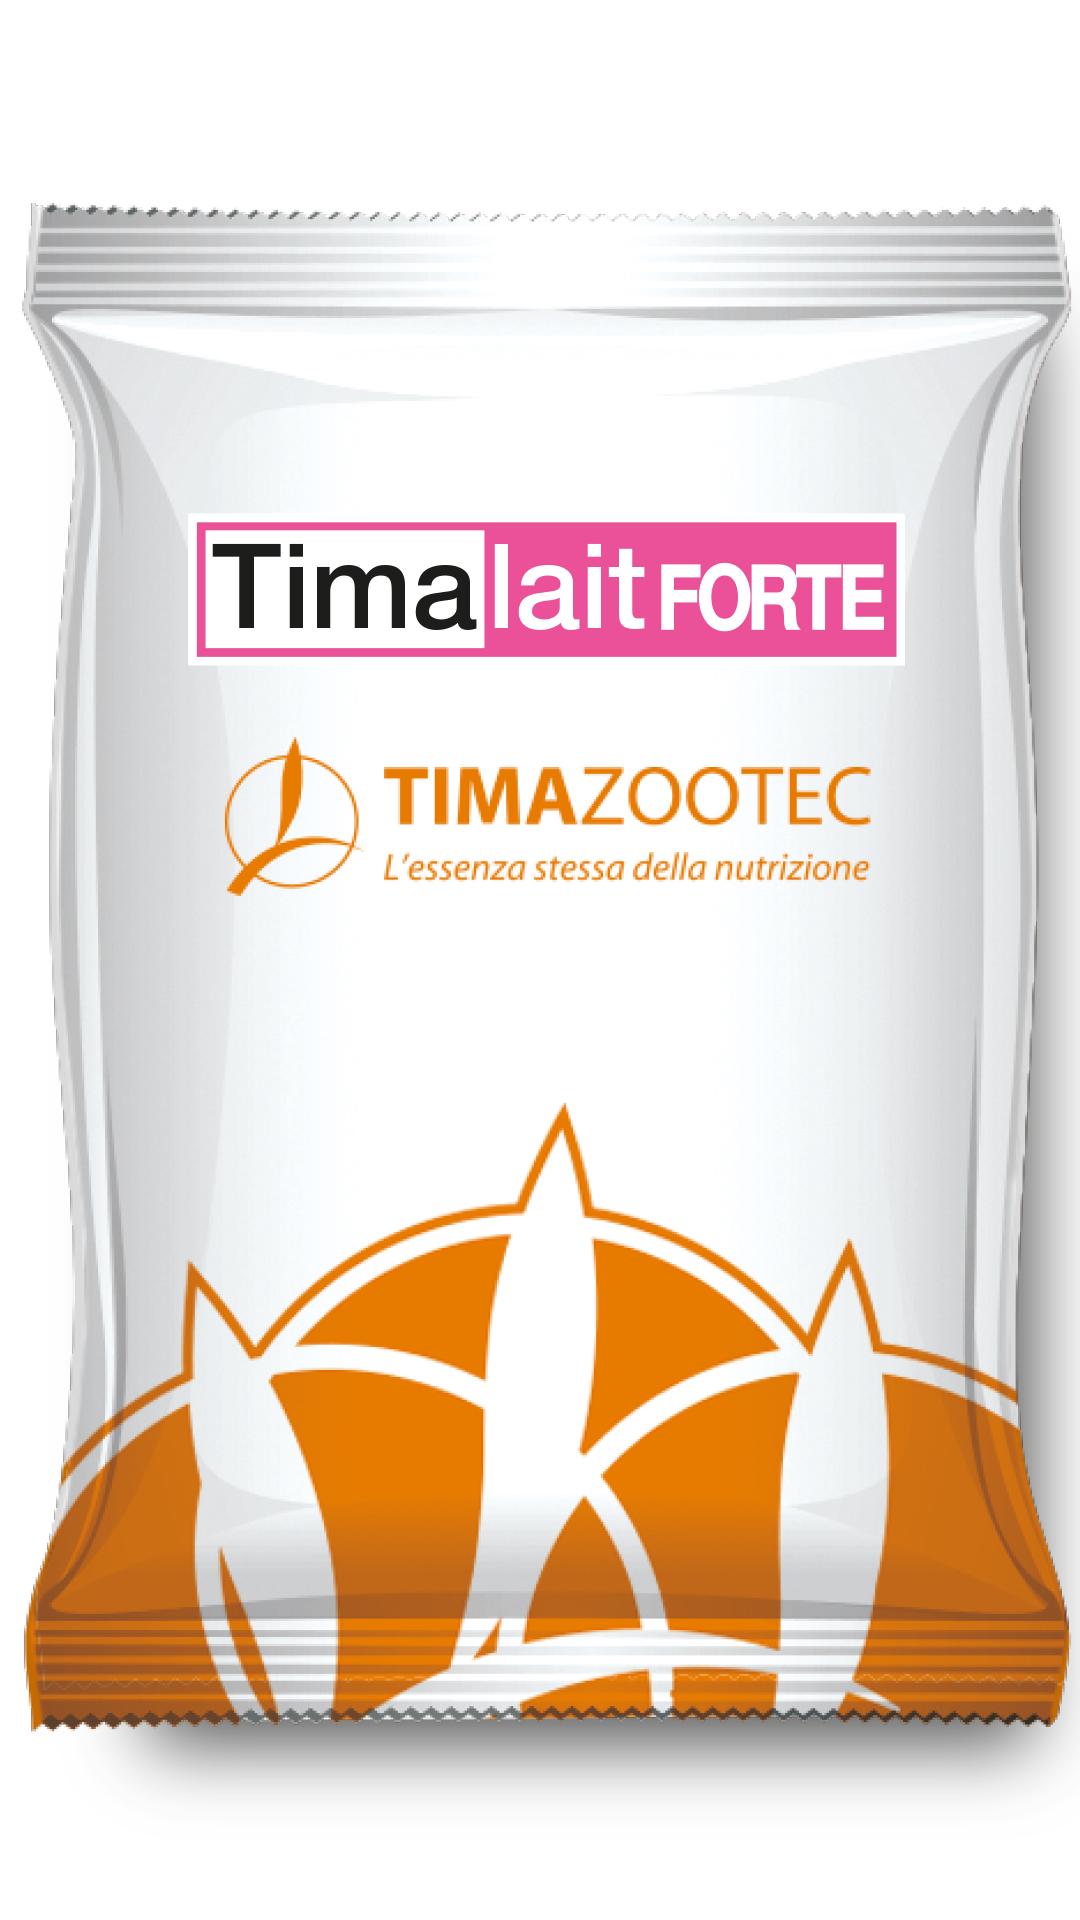 TIMALAIT FORTE